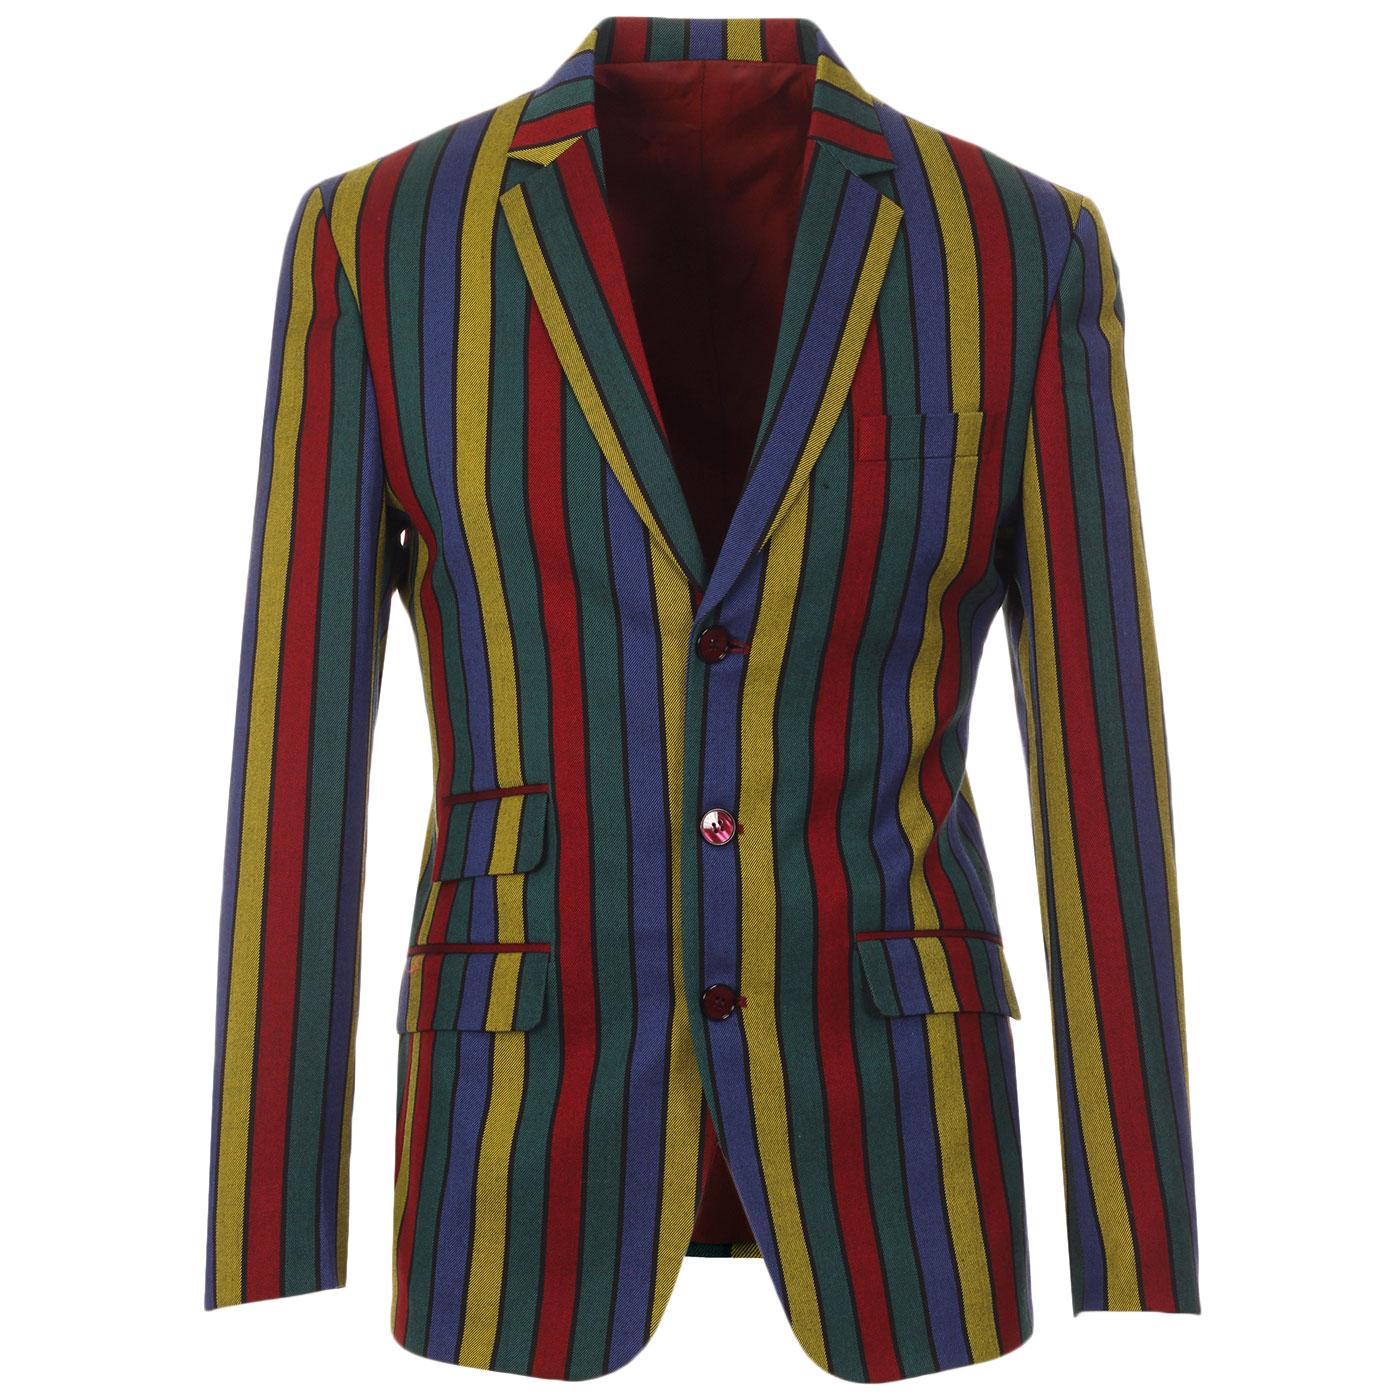 Madcap England Hendrix Stripe Retro Psychedelic 60s Boating Blazer Jacket